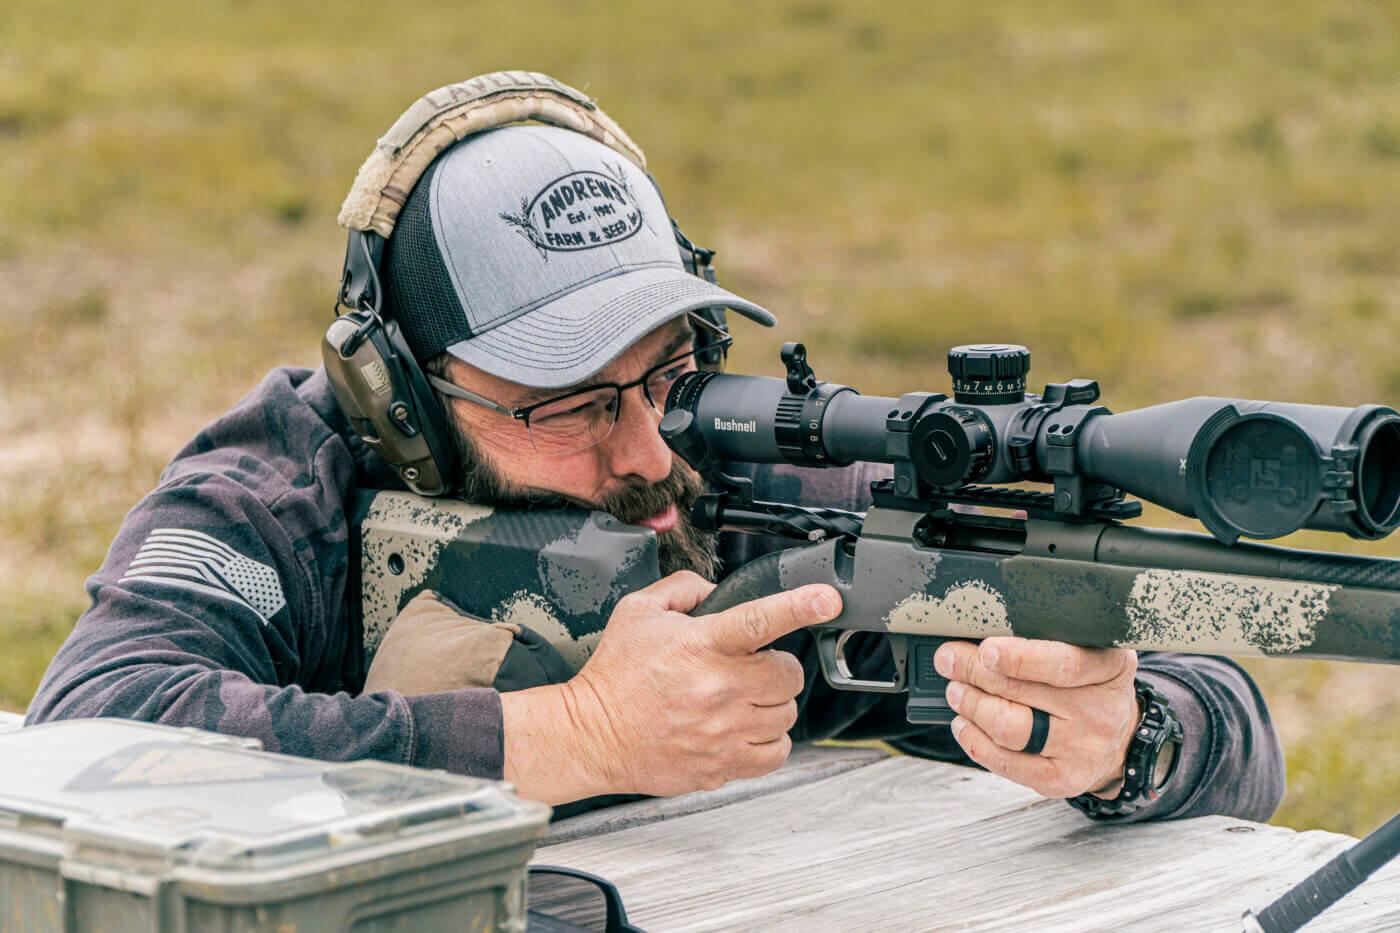 Man shooting rifle with good eye relief